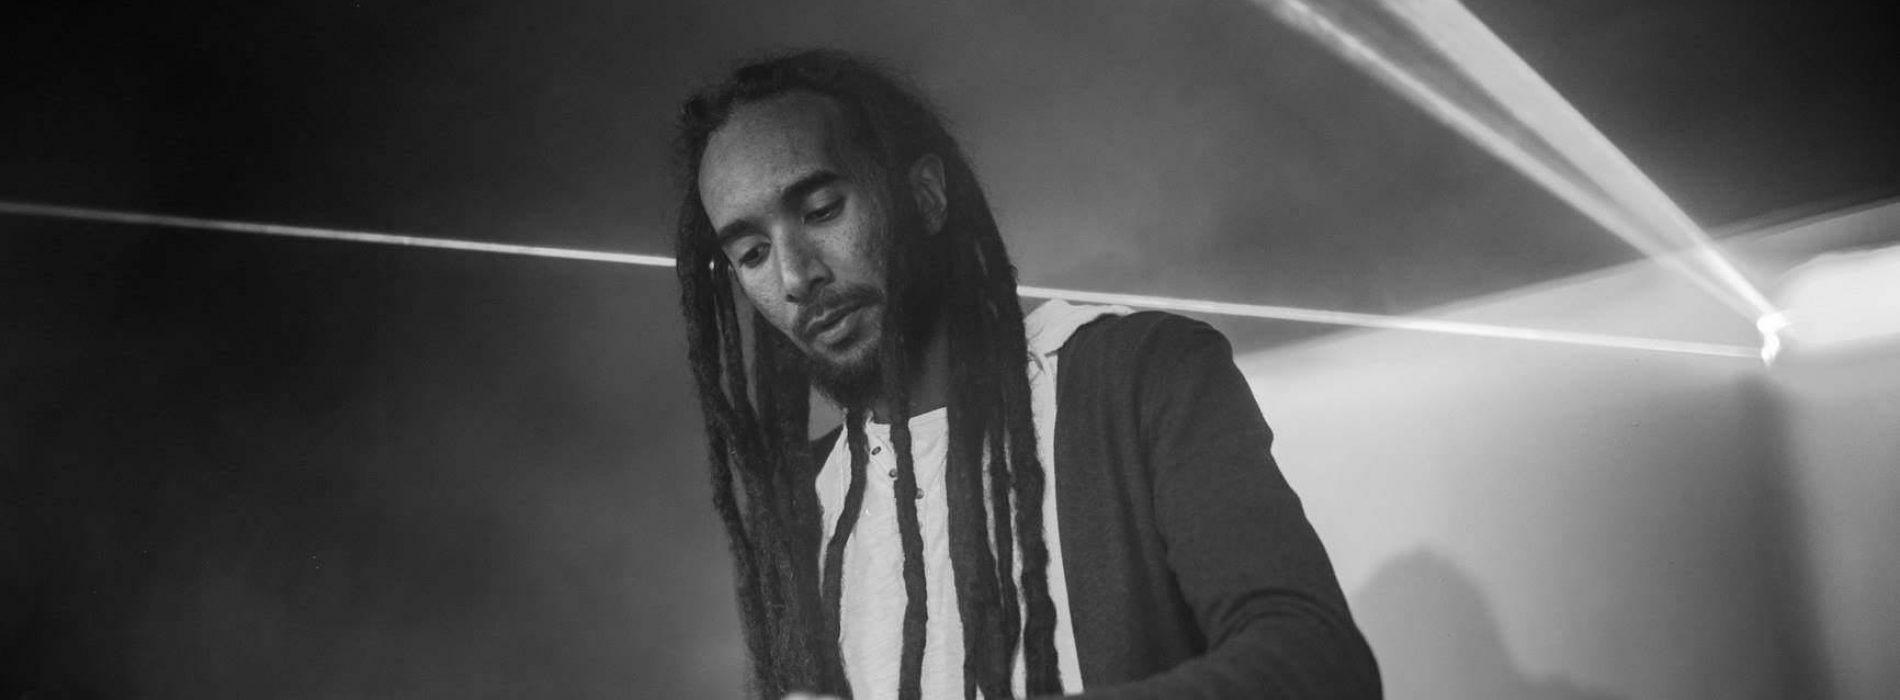 DJ DAN Vice champion DJ Redbull 3style 2016 ( Vidéos et Mixes )  Février 2017